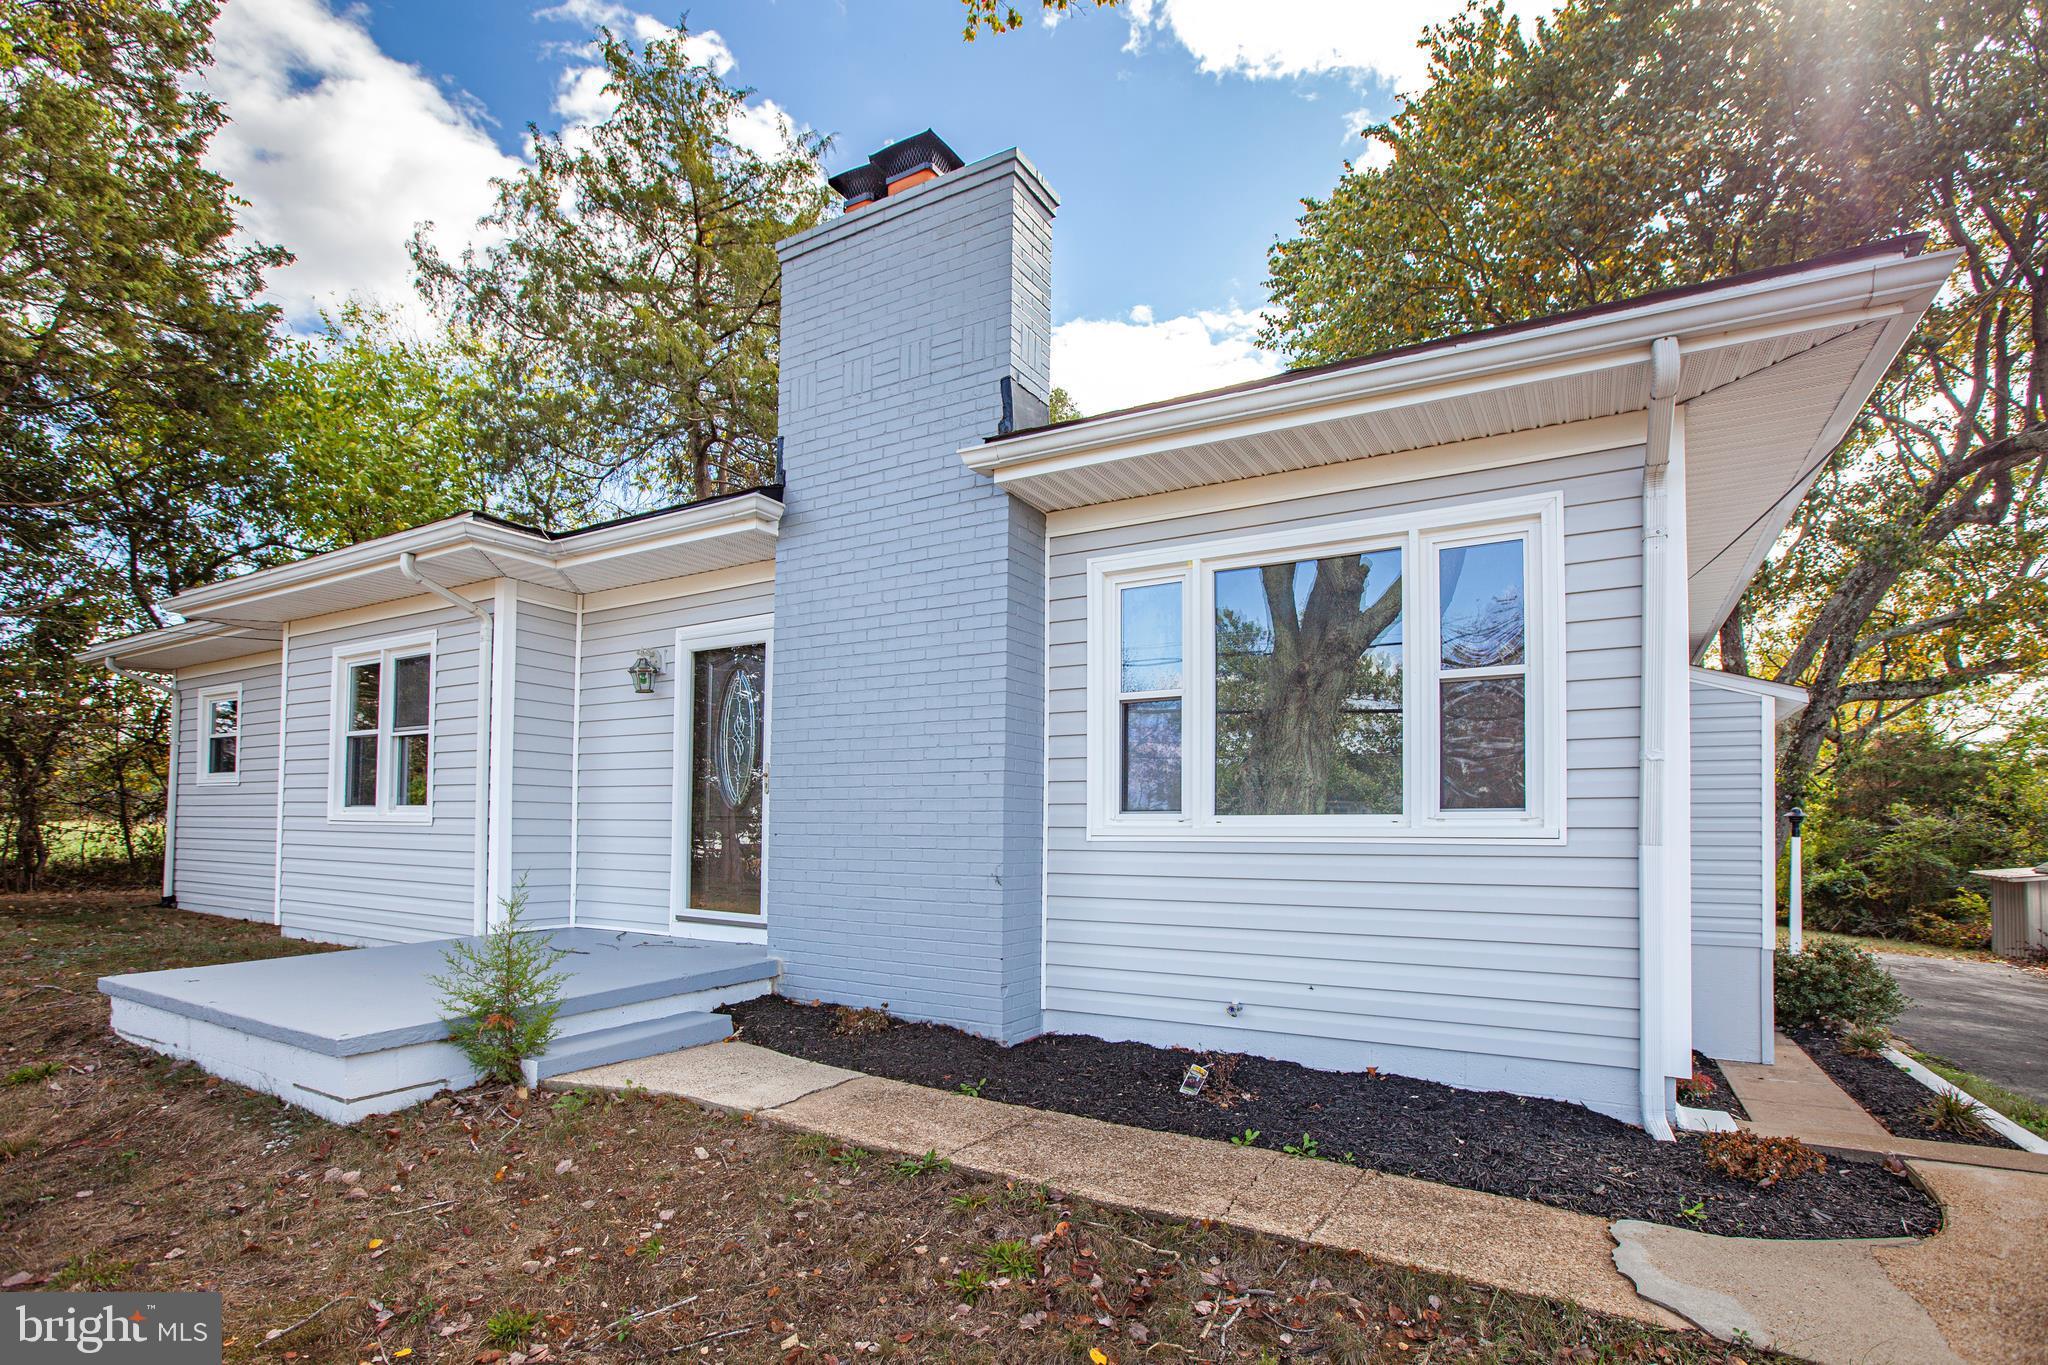 522 WHITE OAK Rd, Fredericksburg, VA, 22405